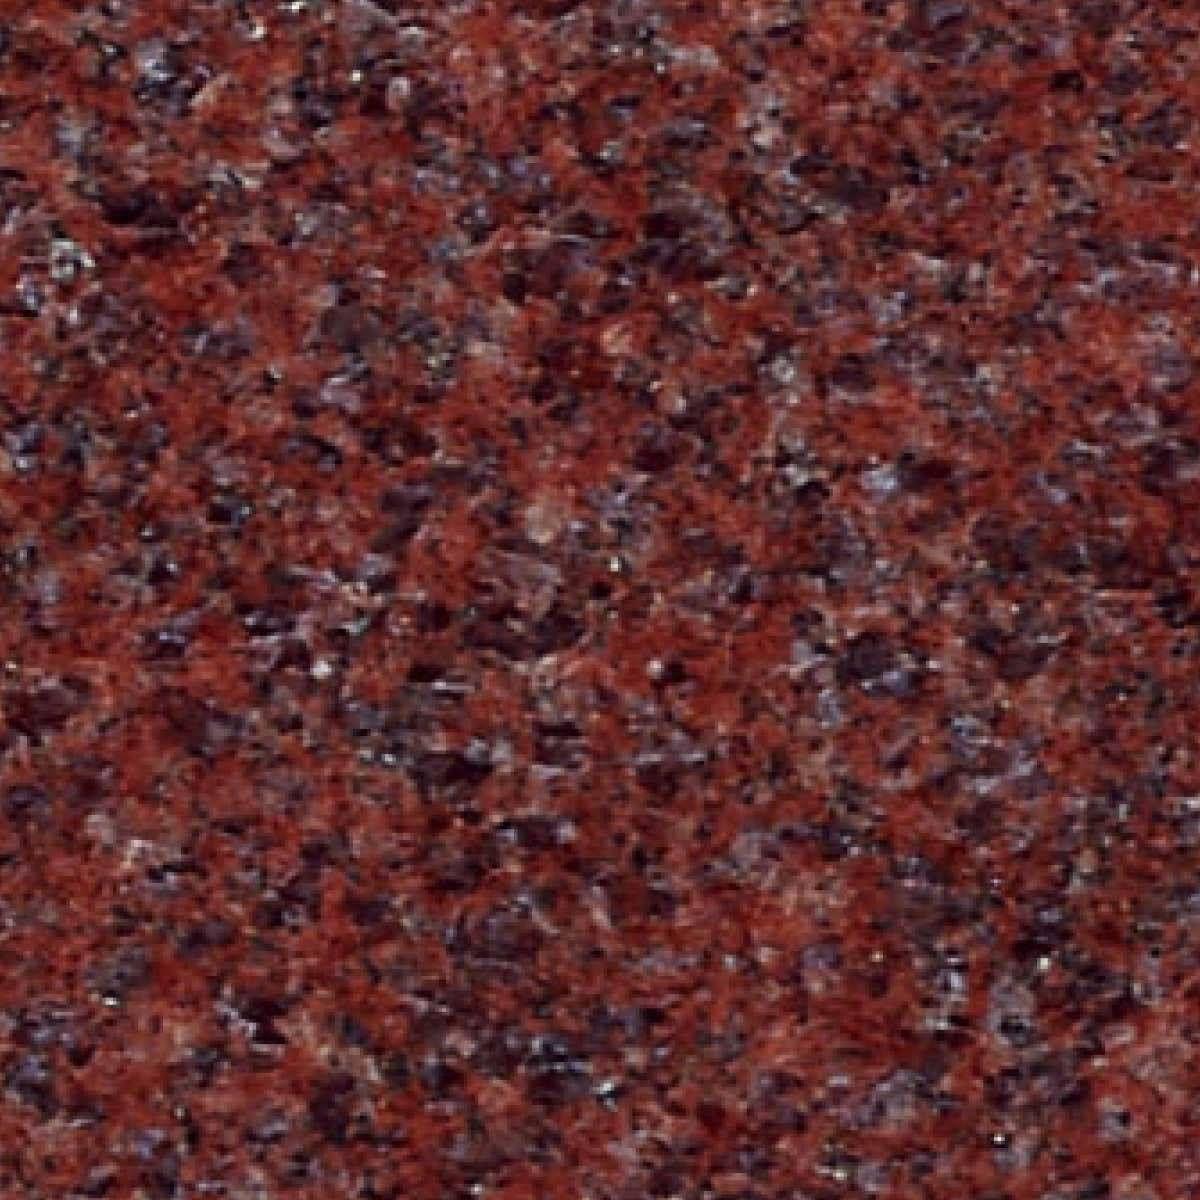 Dark Red Granite With Tiny Flecks Of Dark Blue Light Red